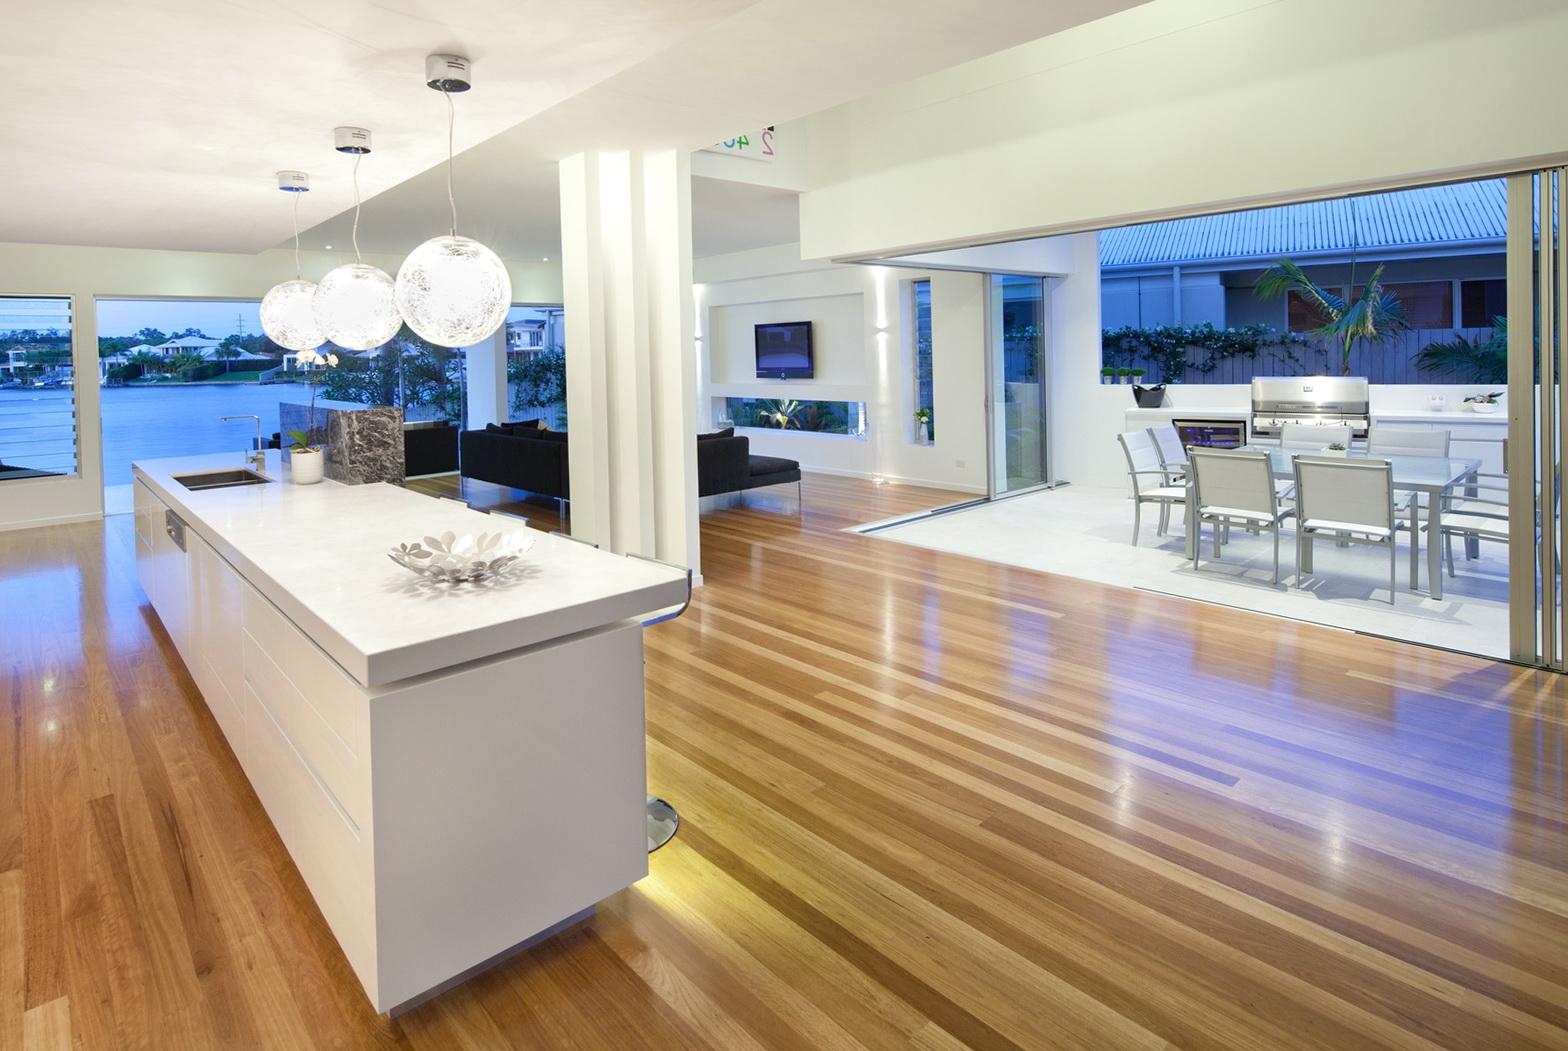 Kitchen Flooring Options Home Depot